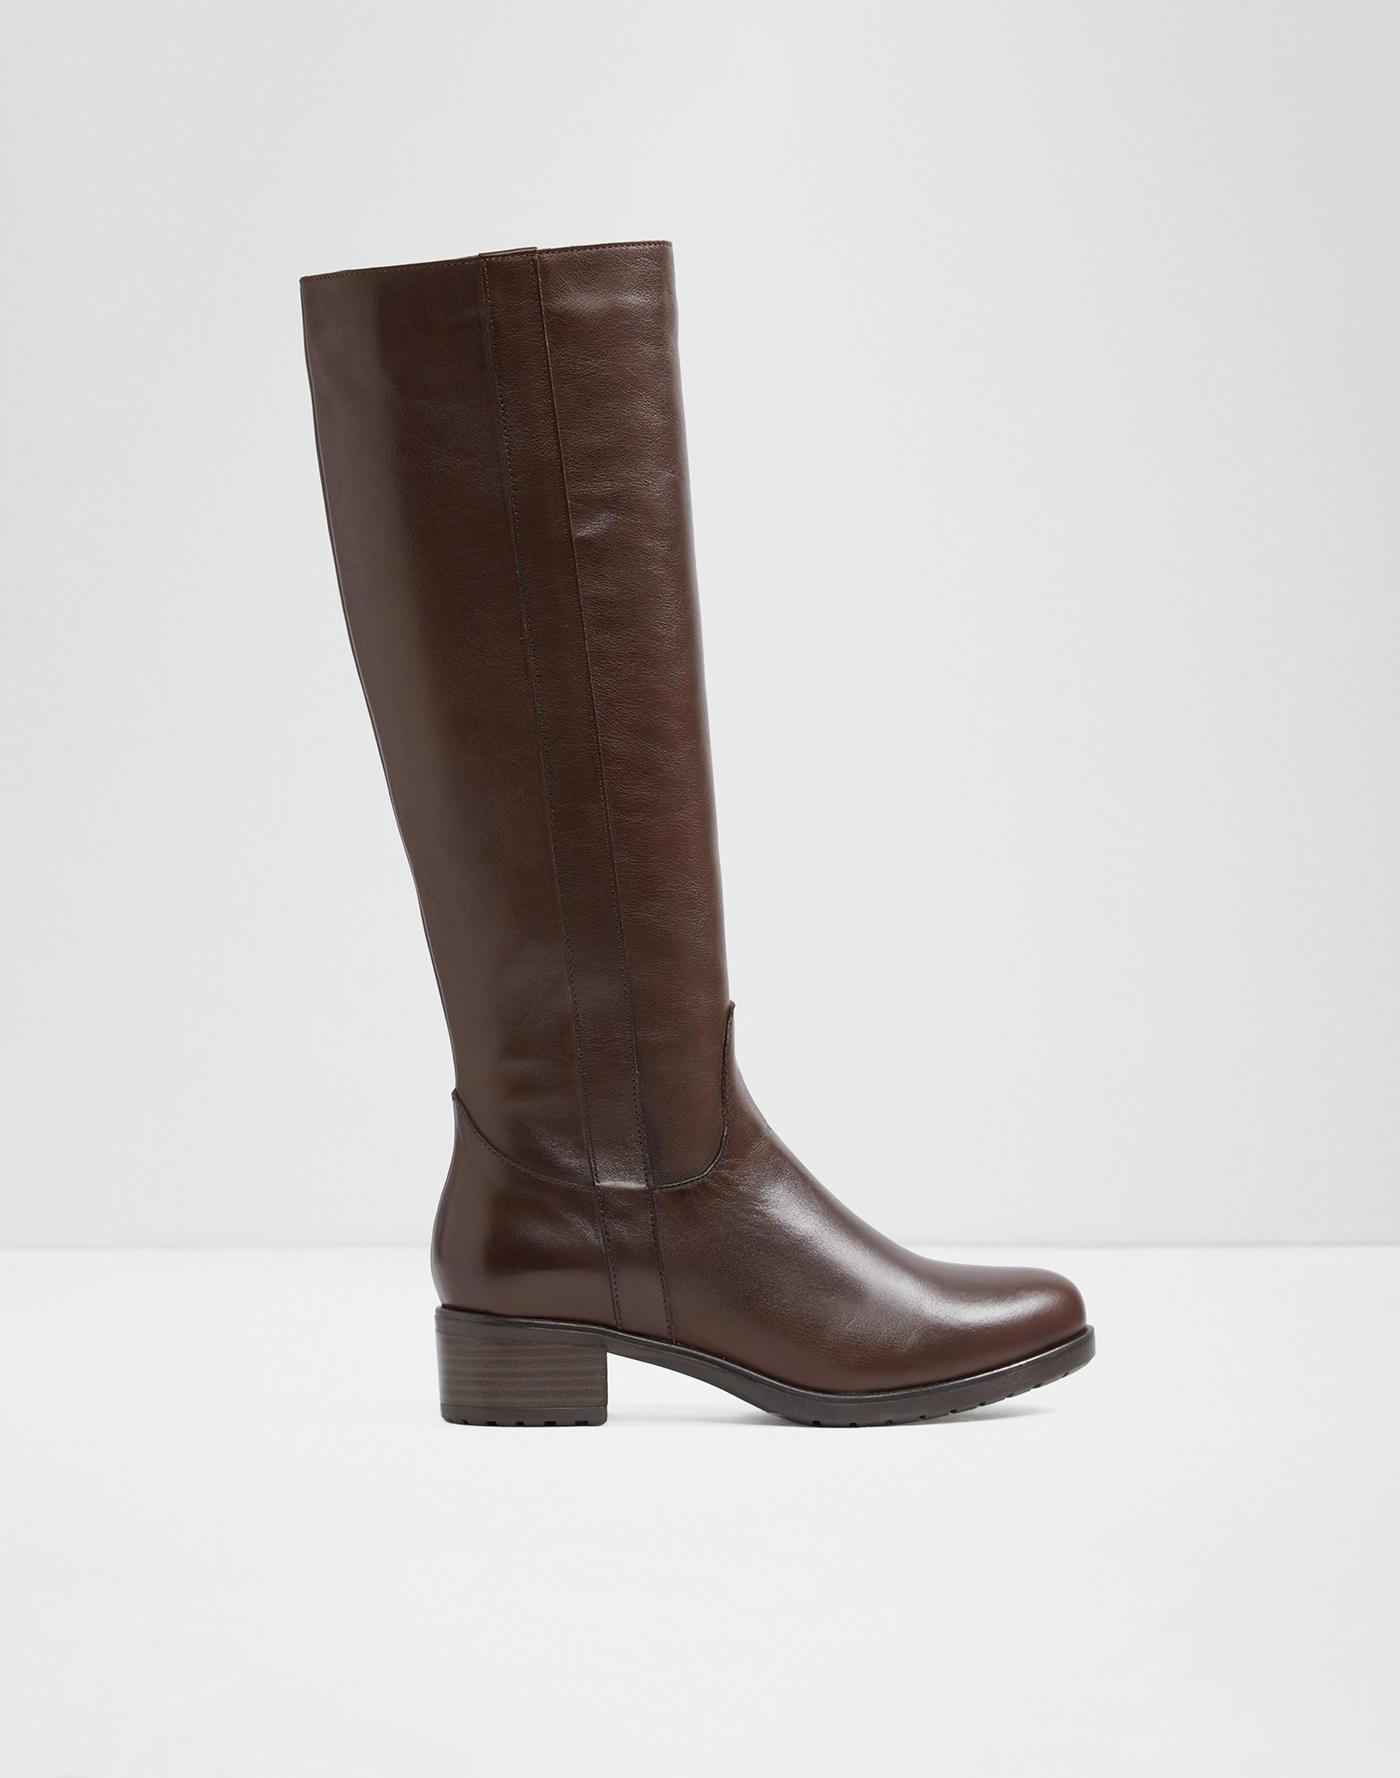 4c2c4a70b281 Knee-high boots